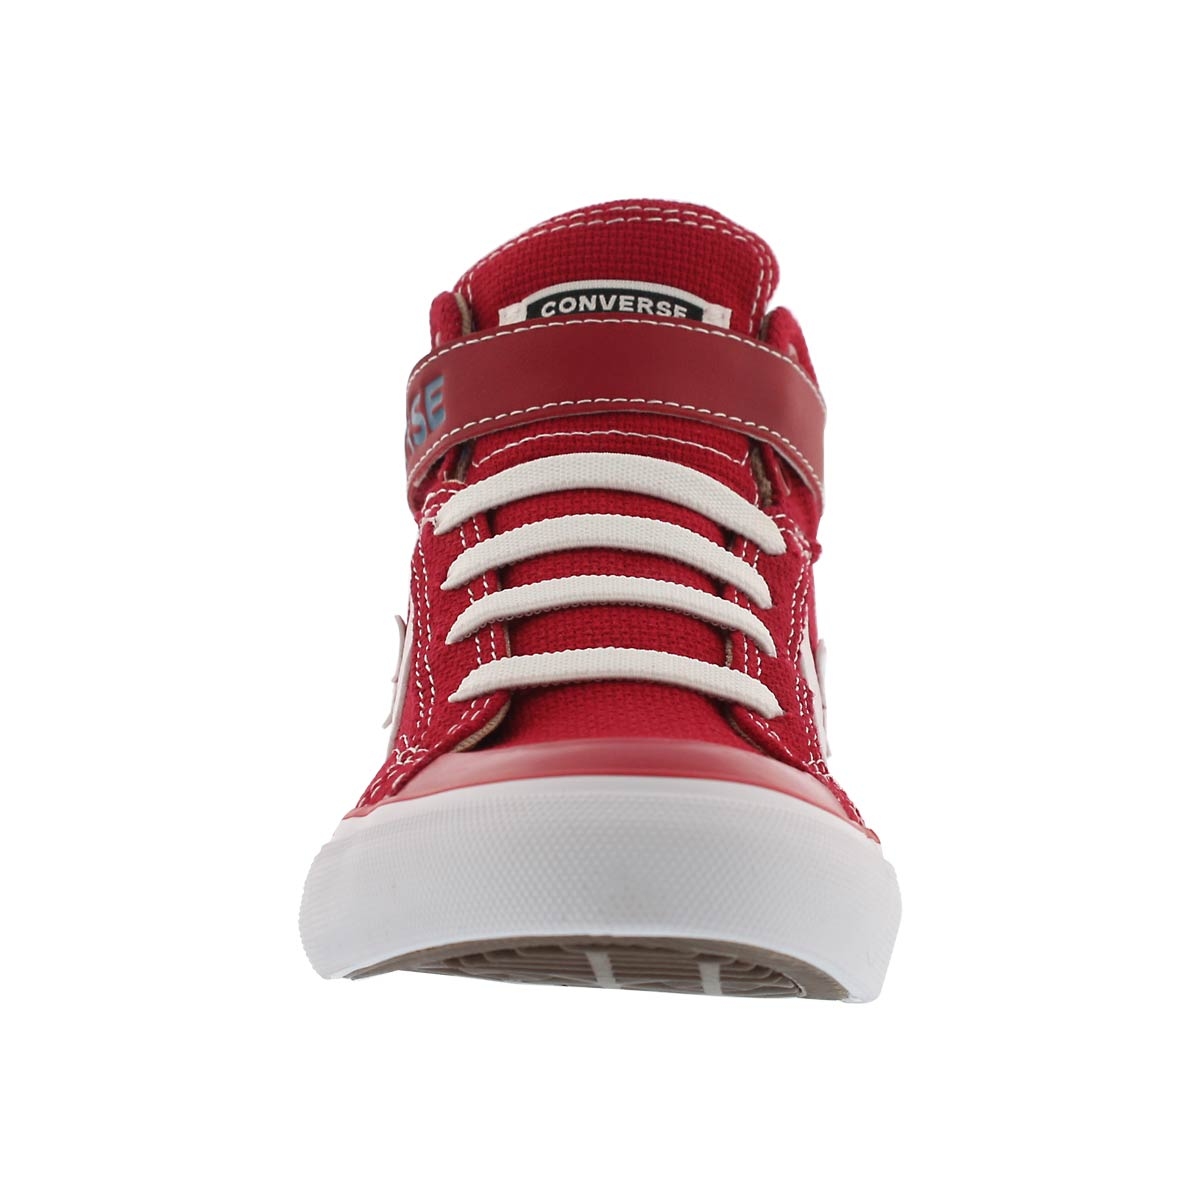 Bys Pro Blaze Strap red hi top sneaker